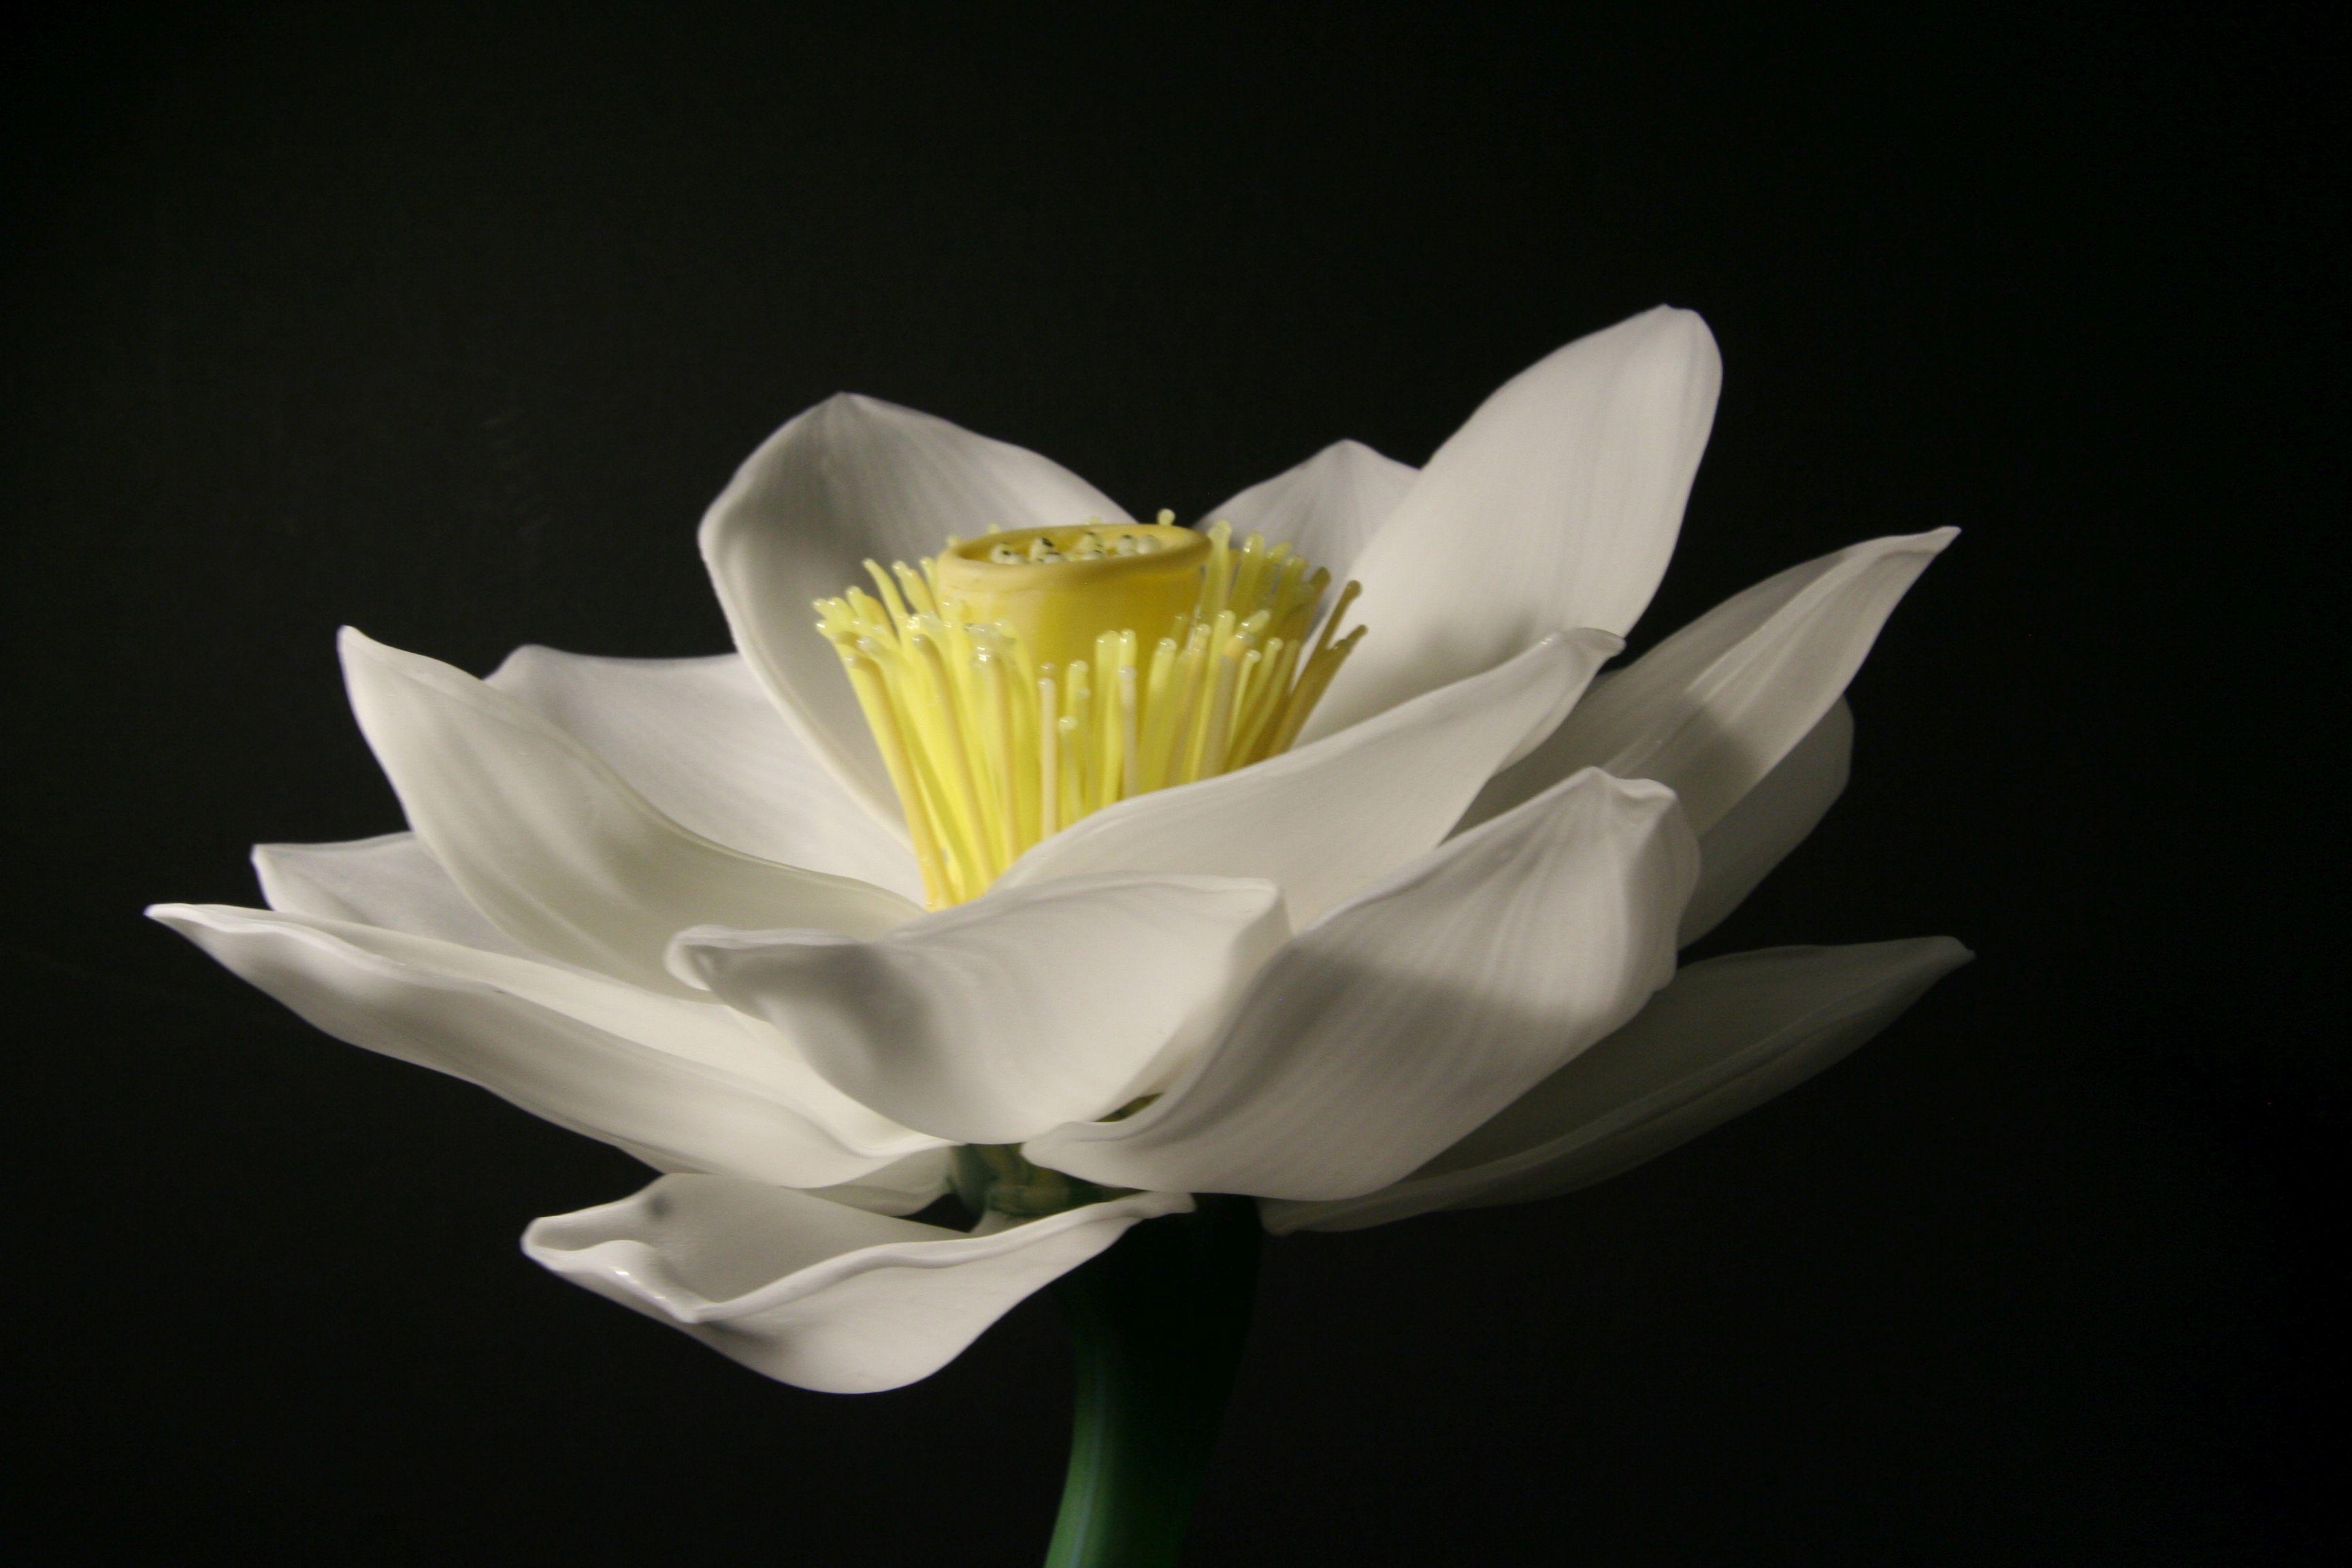 Sally Prasch Lotus